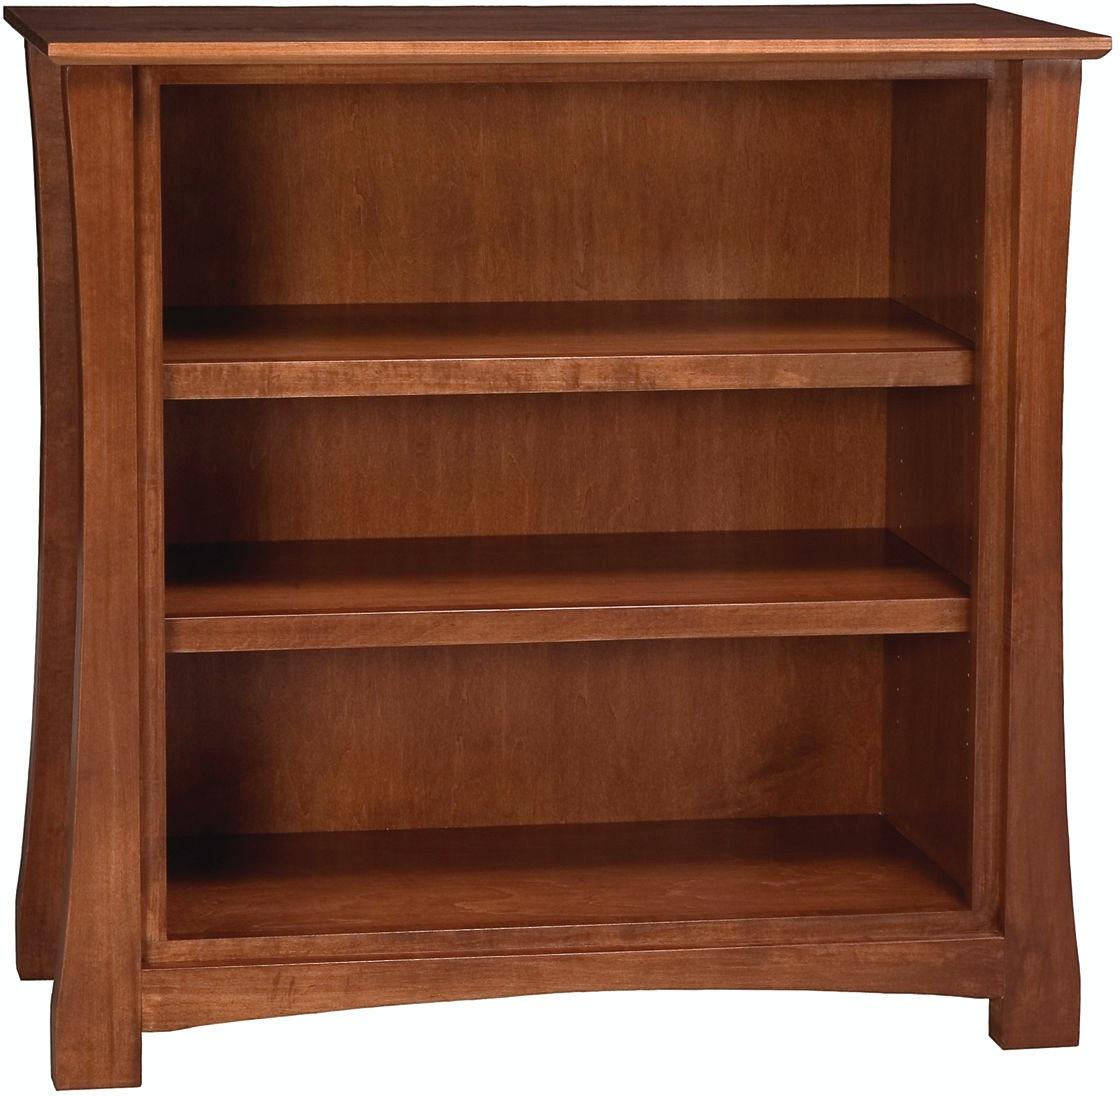 Abalone Home Office 3 Bookcase Aw8203 Borofka S Furniture